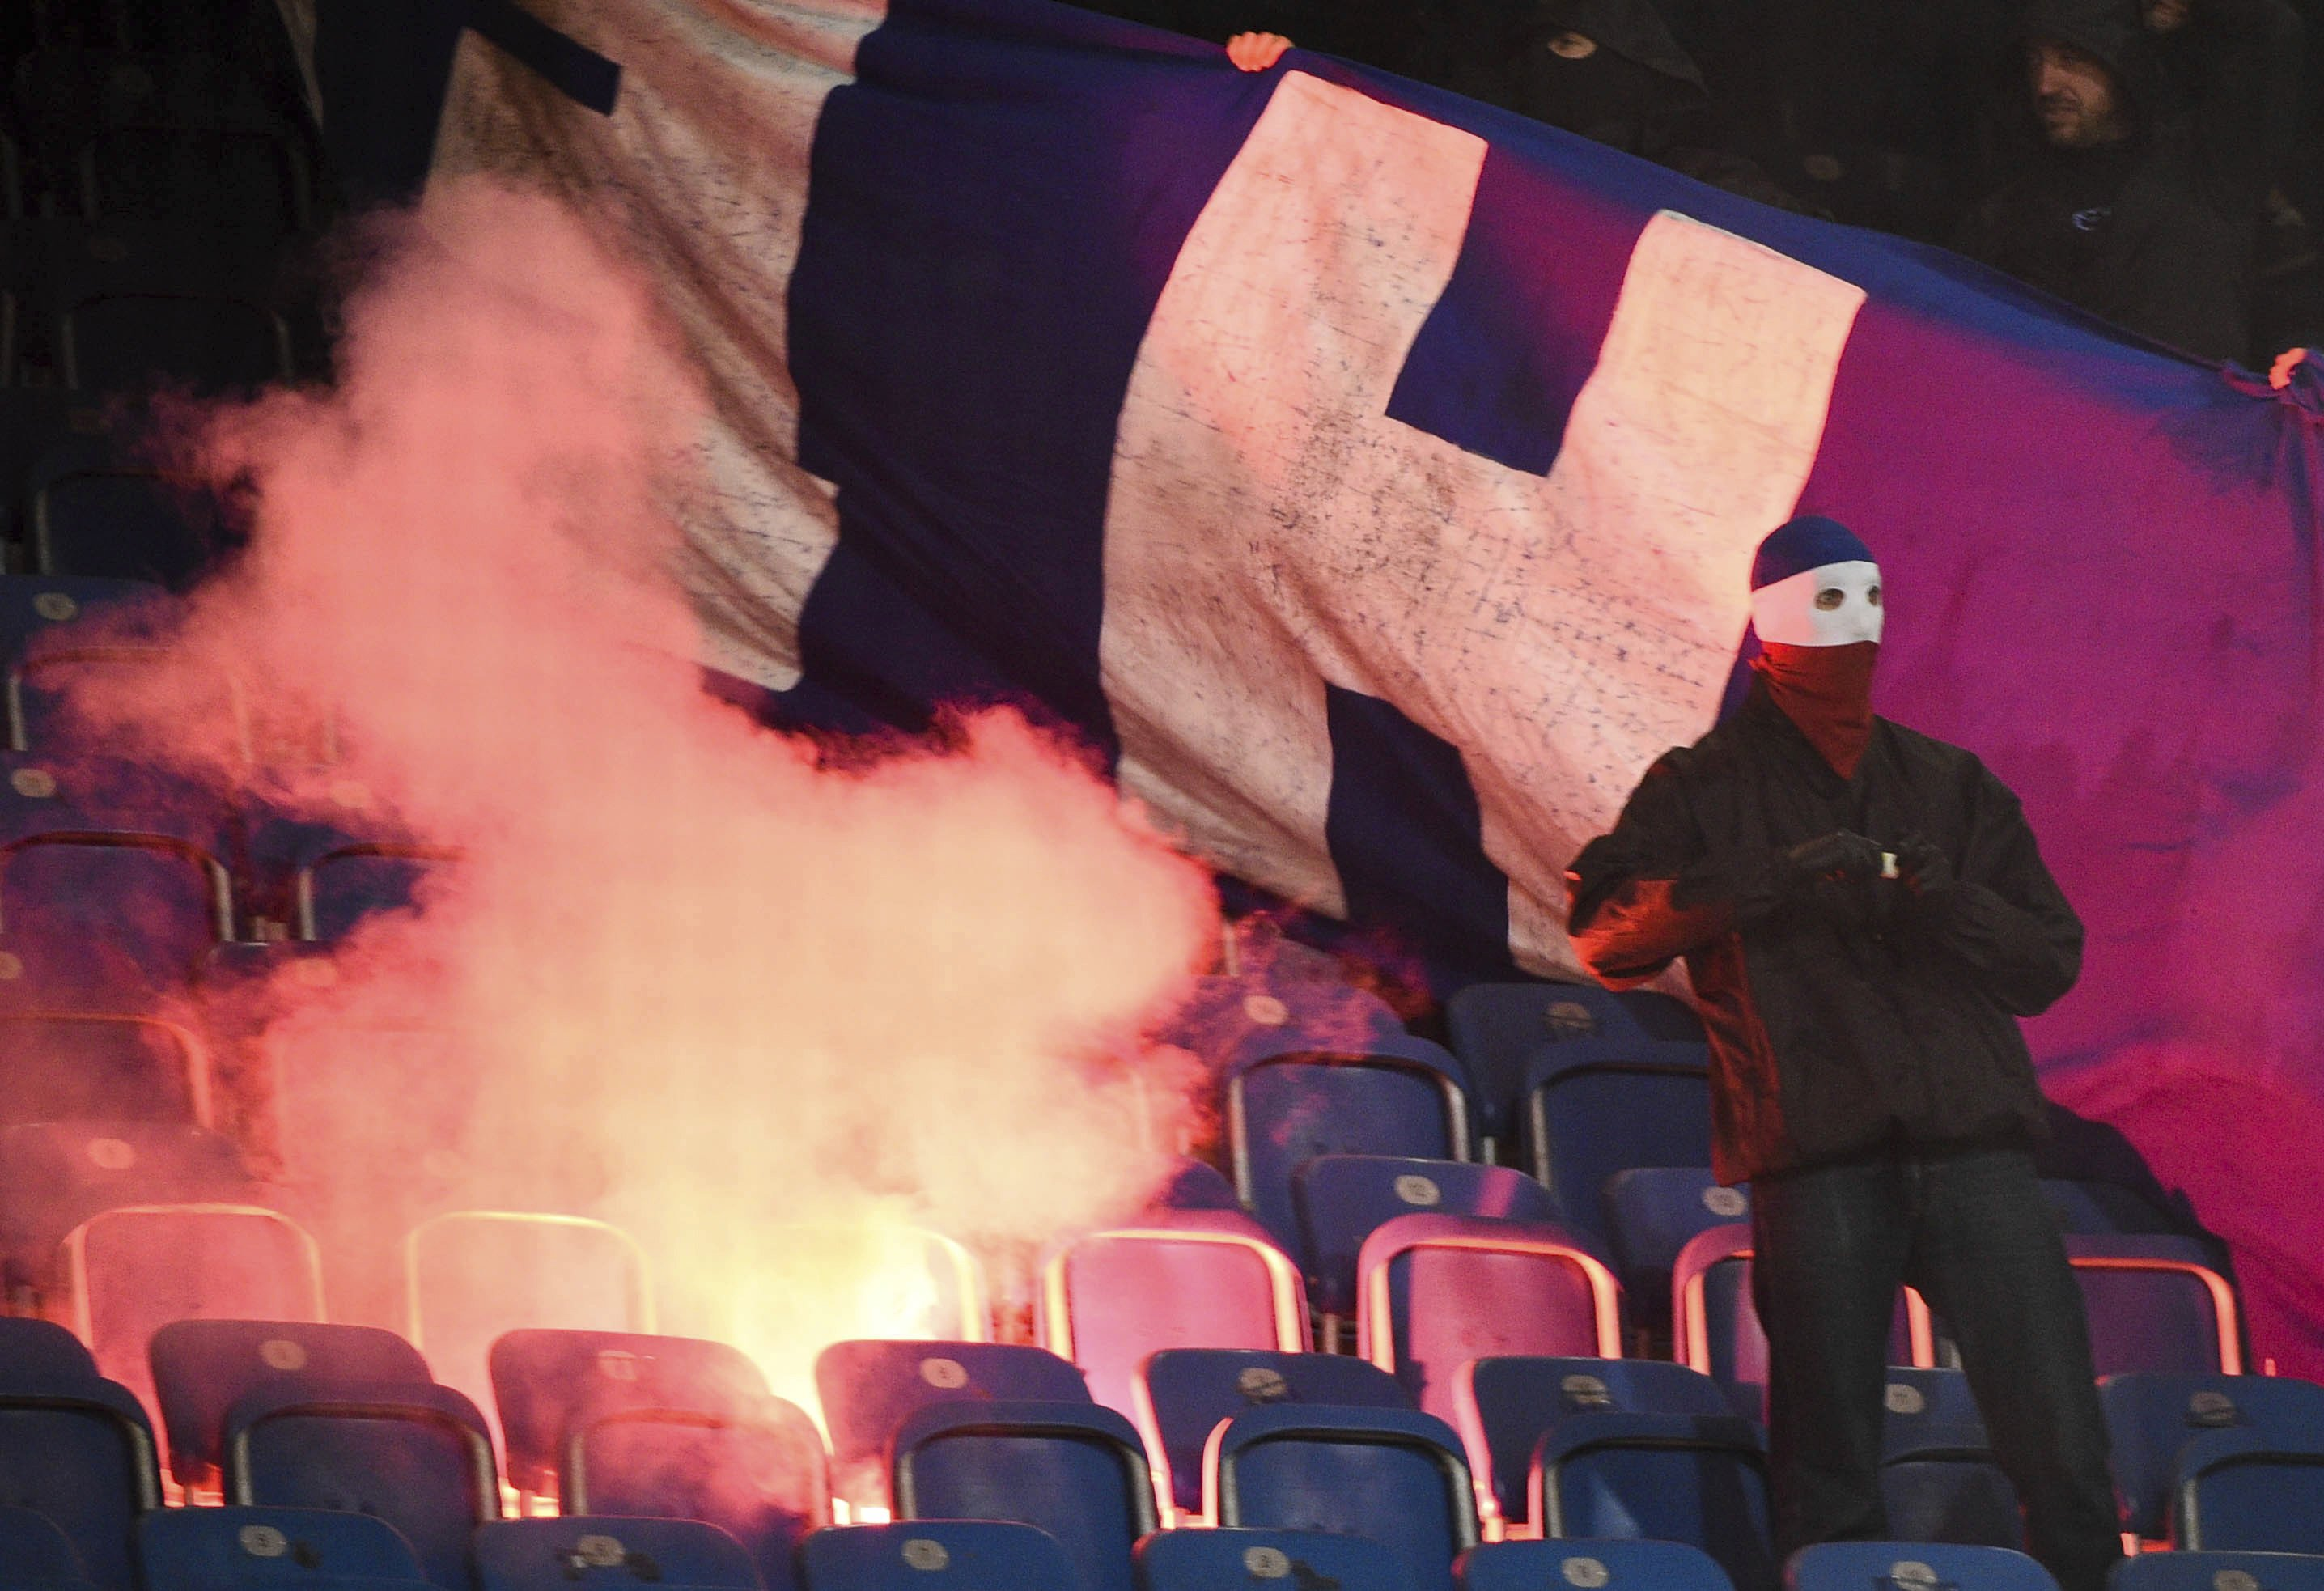 Fears of violence overshadowing Bundesliga restart